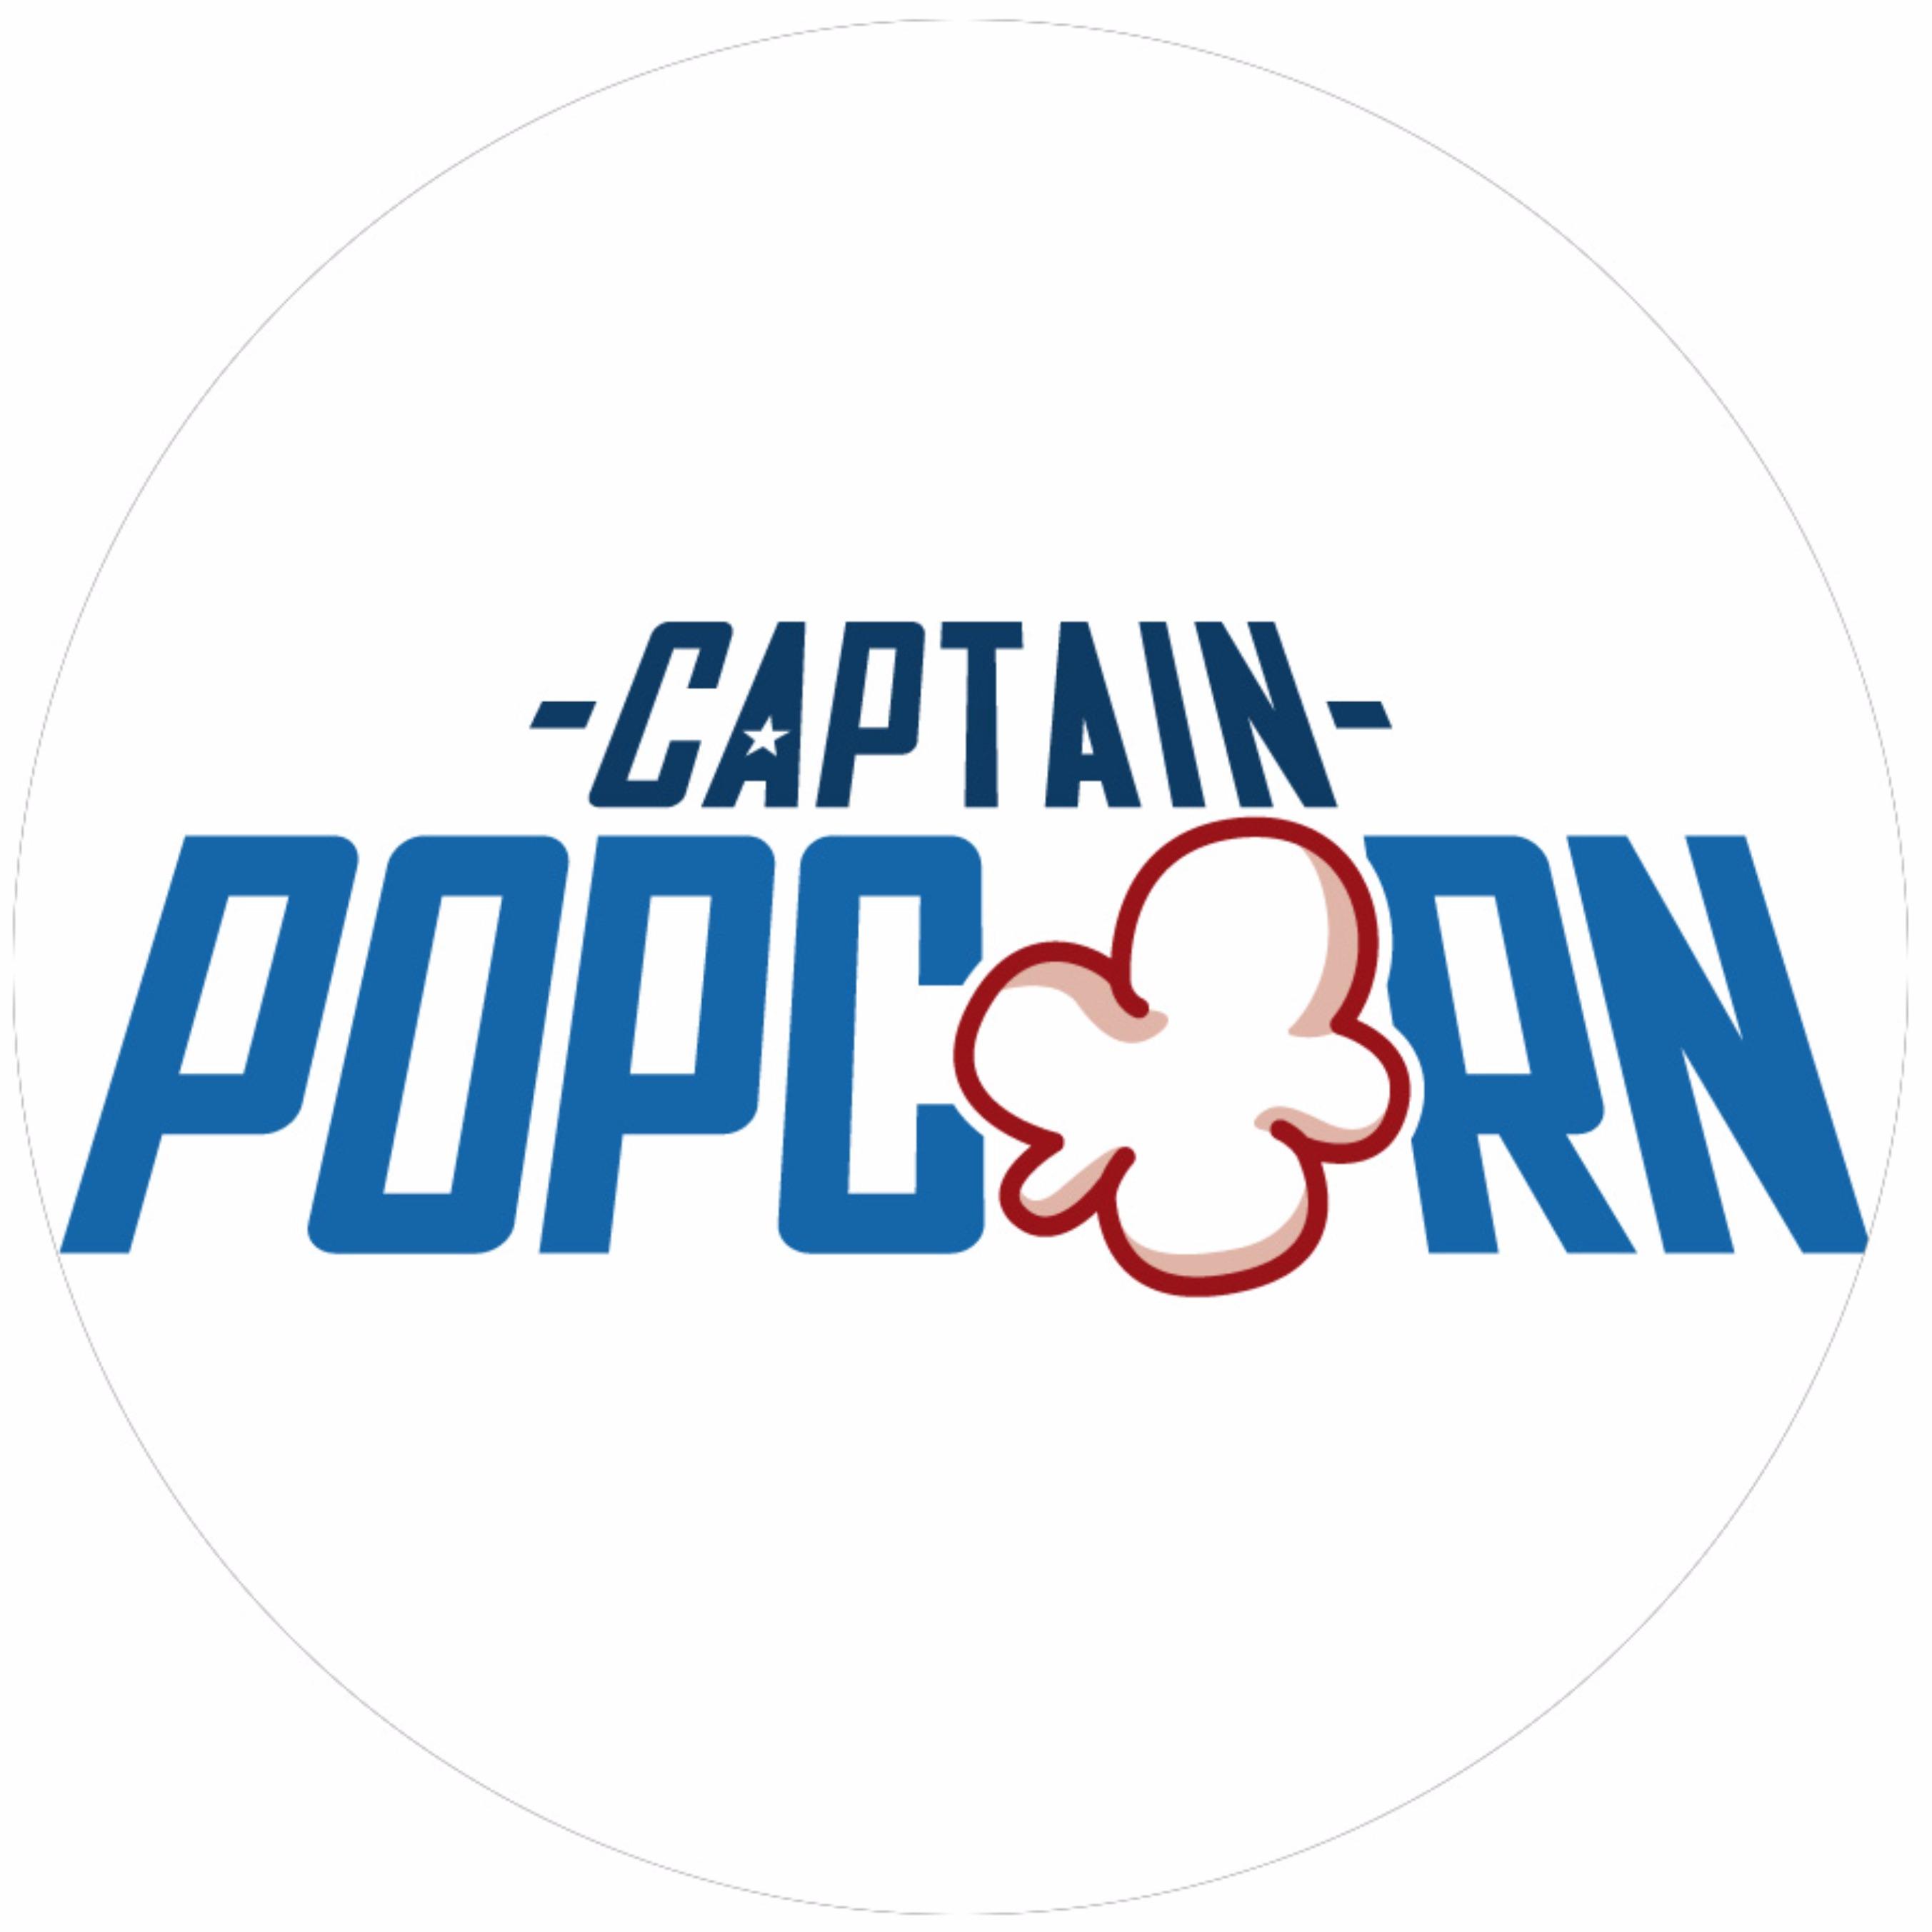 Captain Popcorn